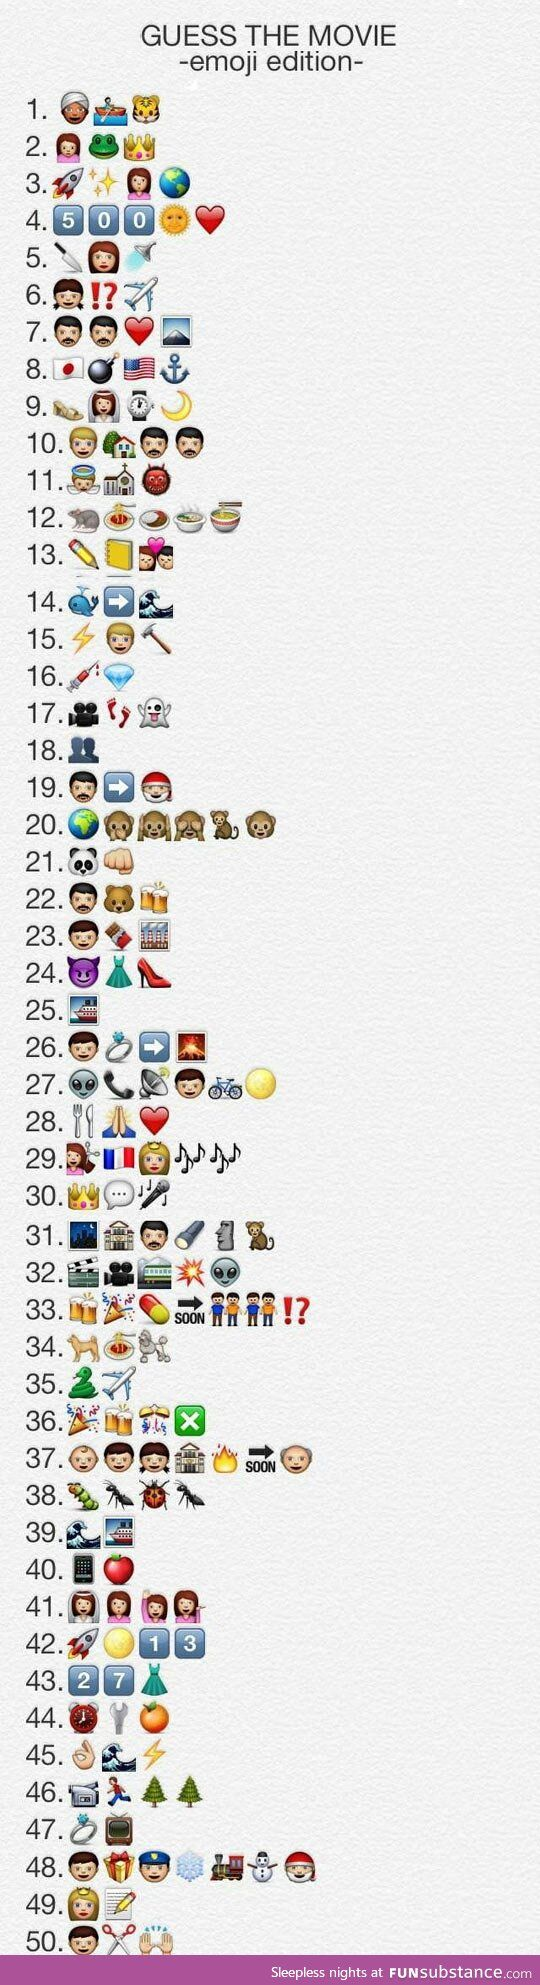 Guess the emoji movie                                                                                                                                                                                 More